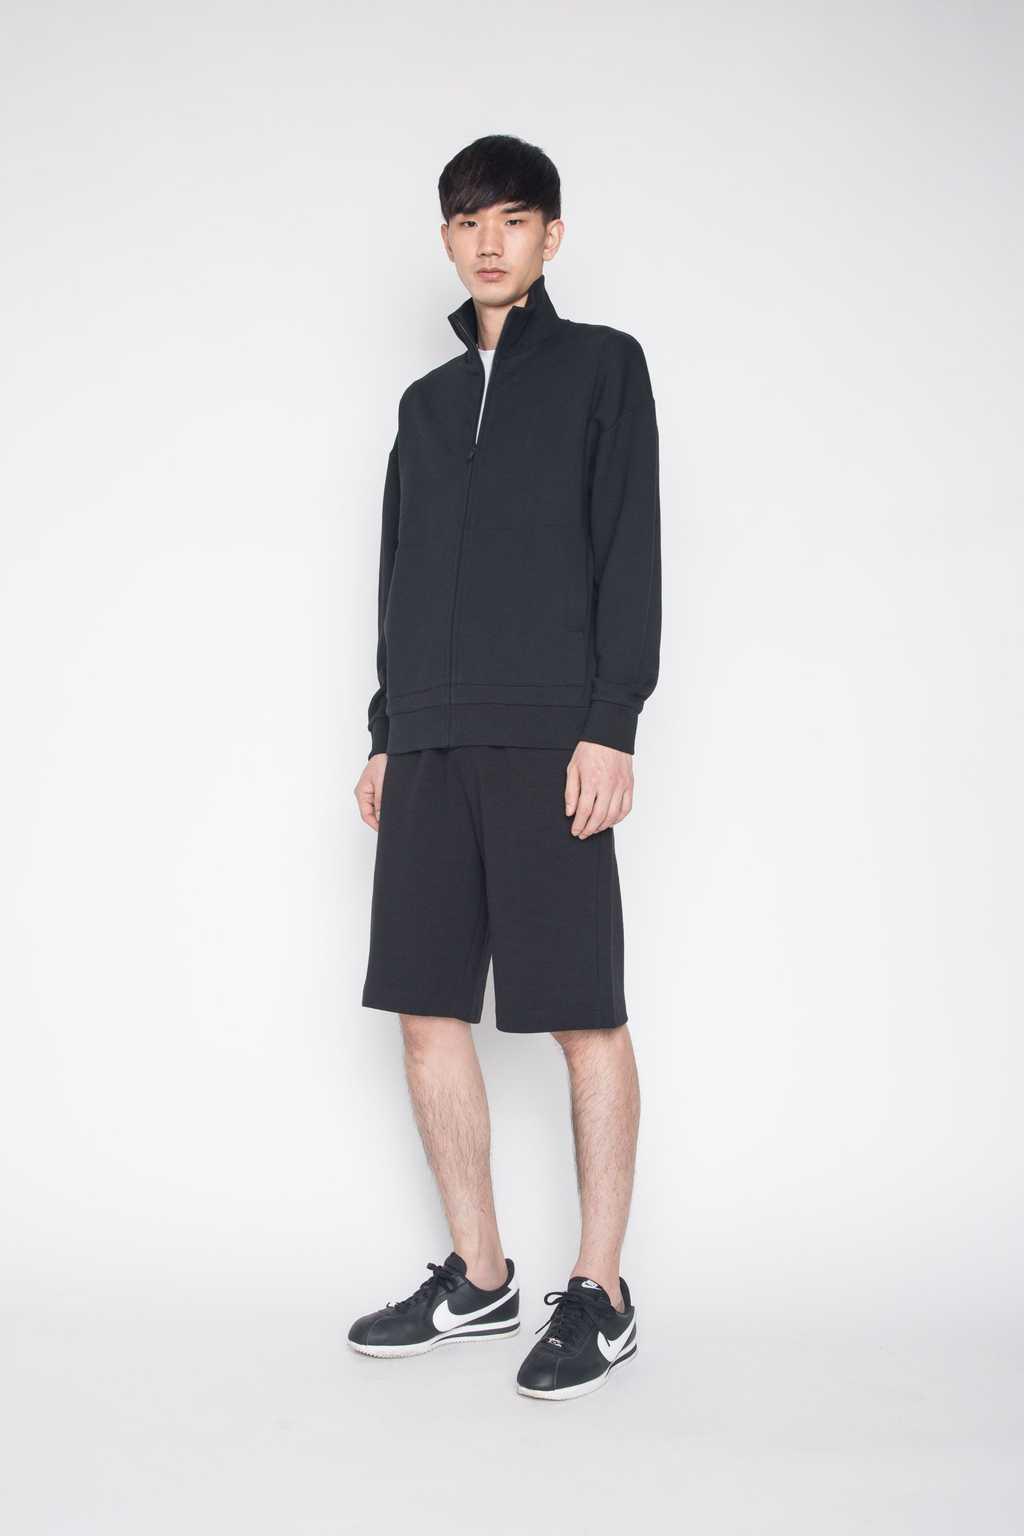 Jacket 1360 Black 7